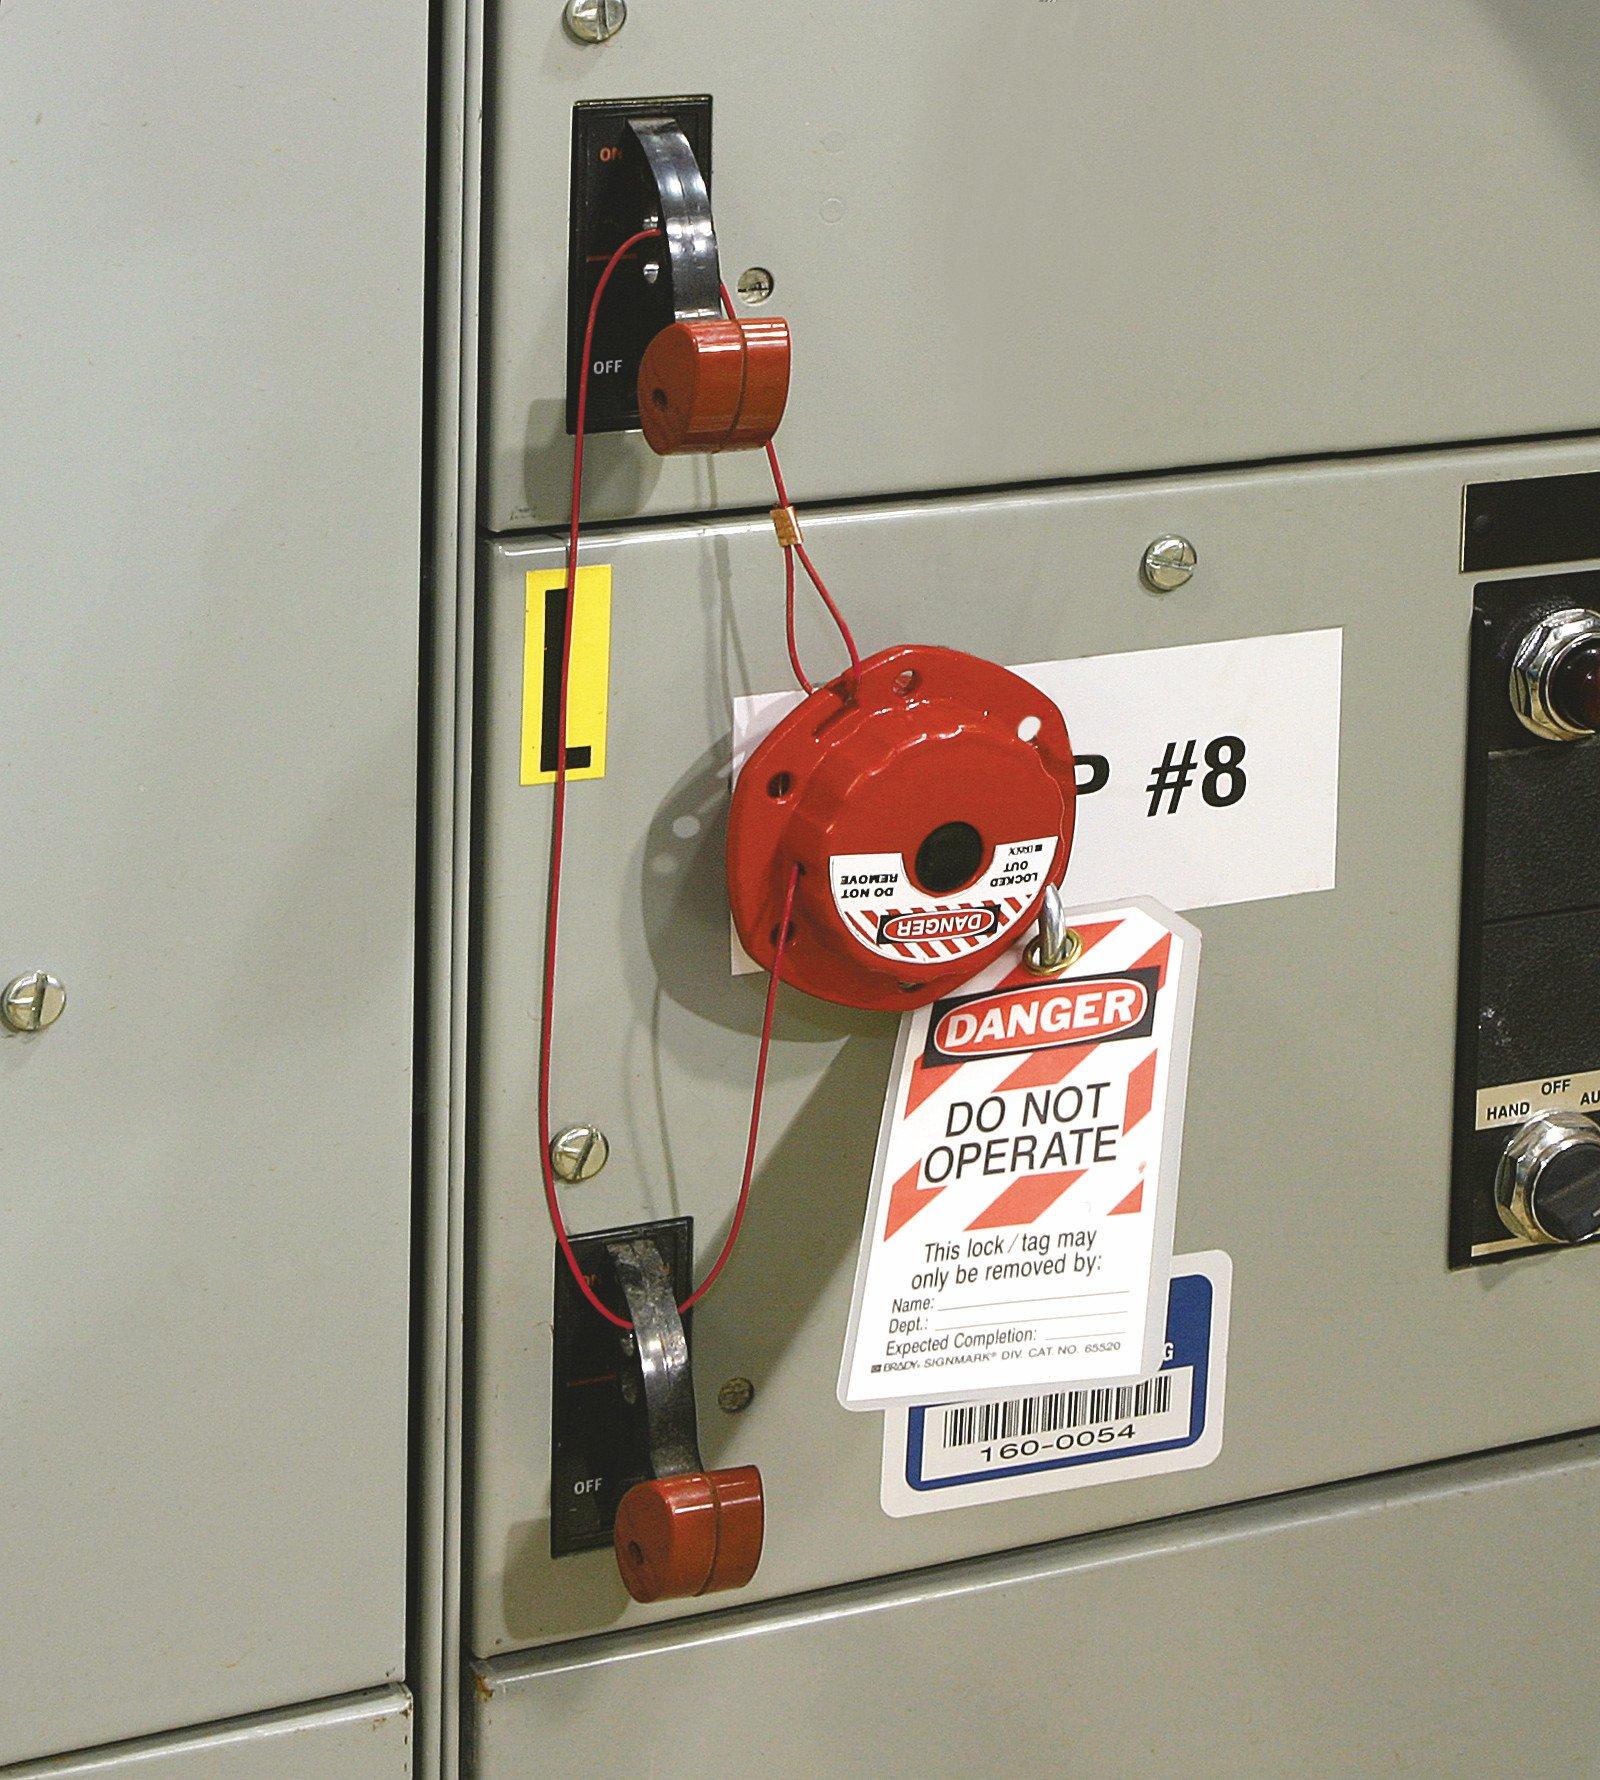 Brady Personal Electrical Lockout Toolbox Kit, Includes 2 Safety Padlocks by Brady (Image #5)